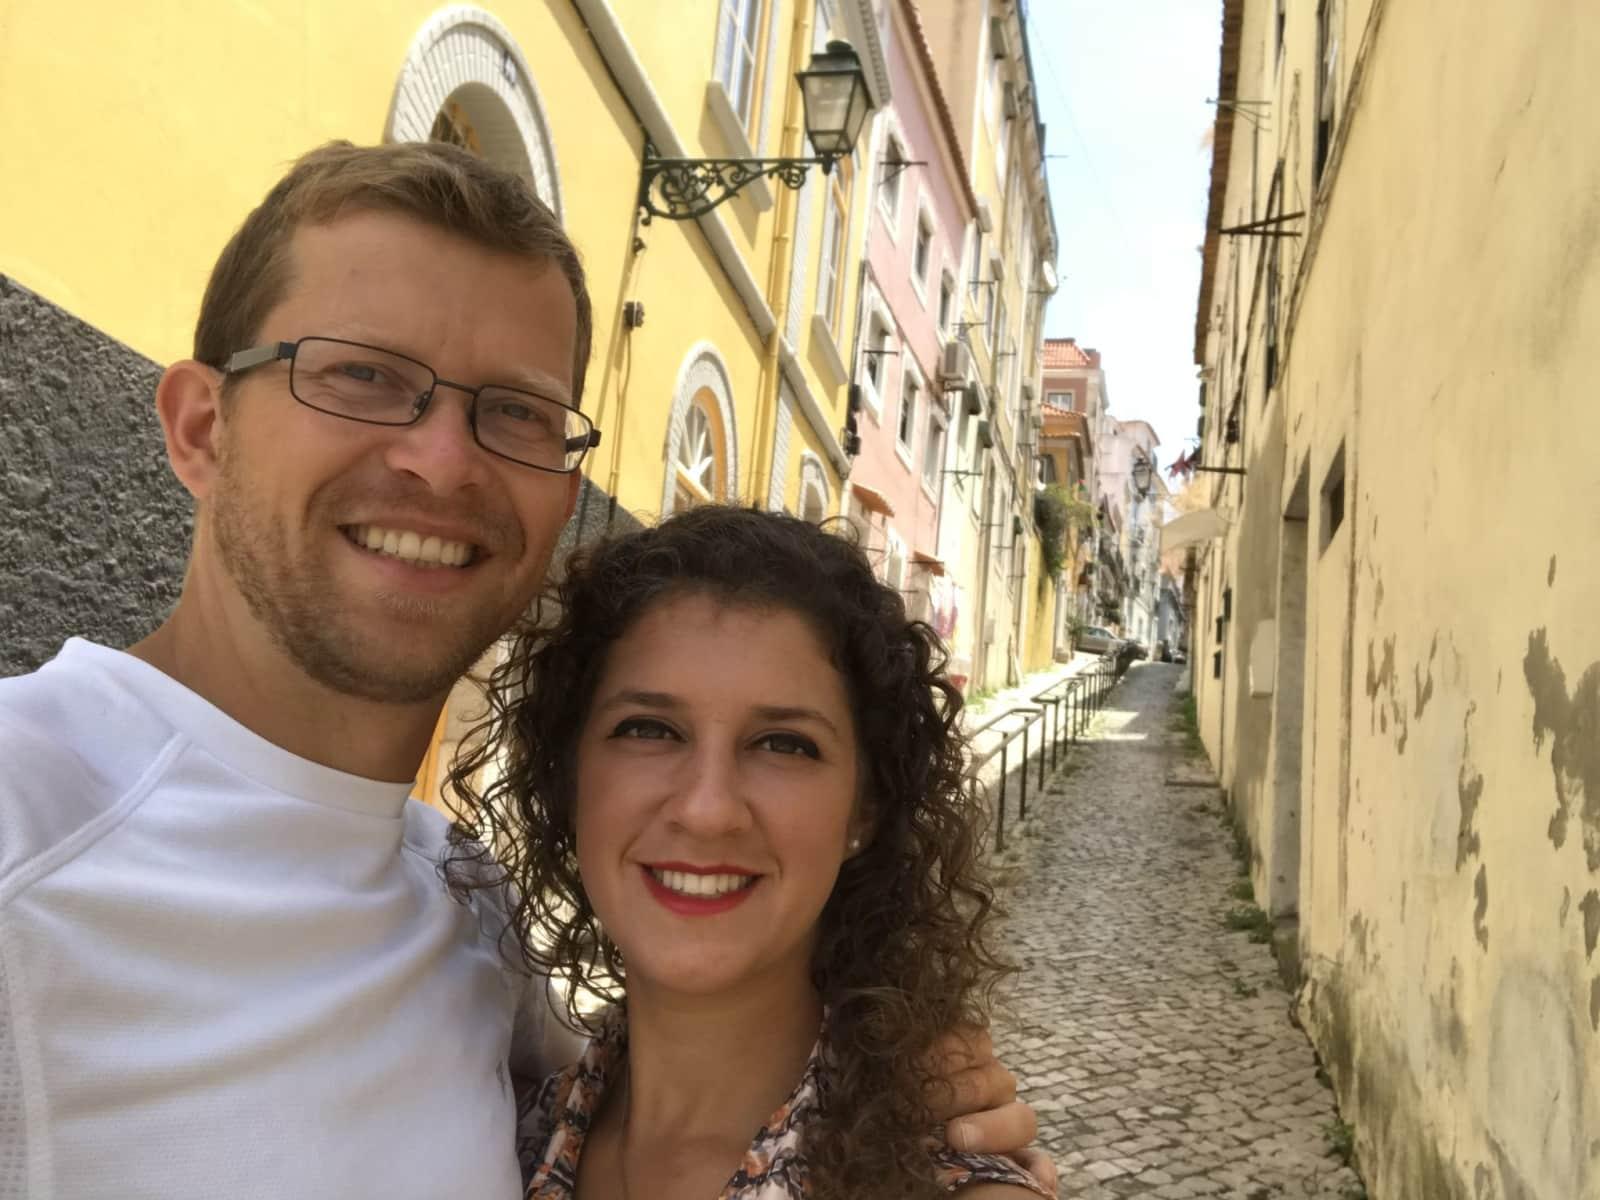 Julieta & Paweł from London, United Kingdom